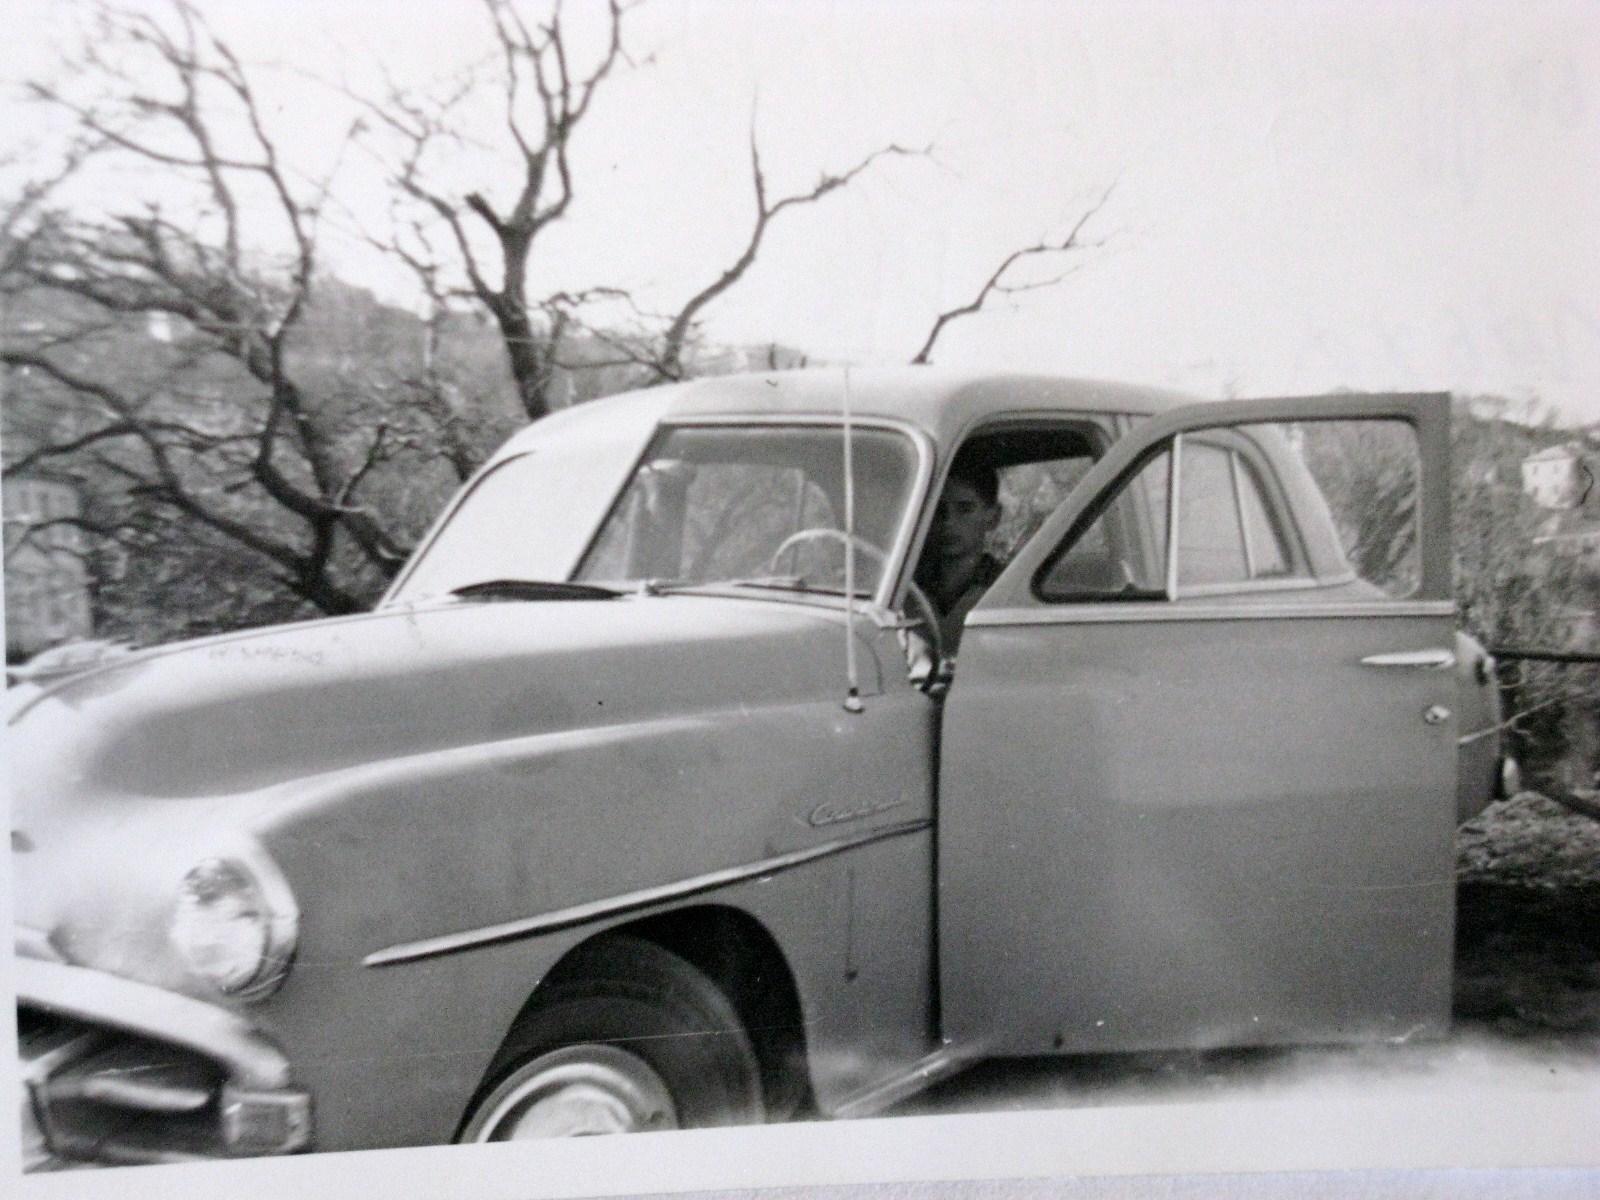 The Plymouth '52 and Byron ca. 1958 in Tsagarada, Pelion.